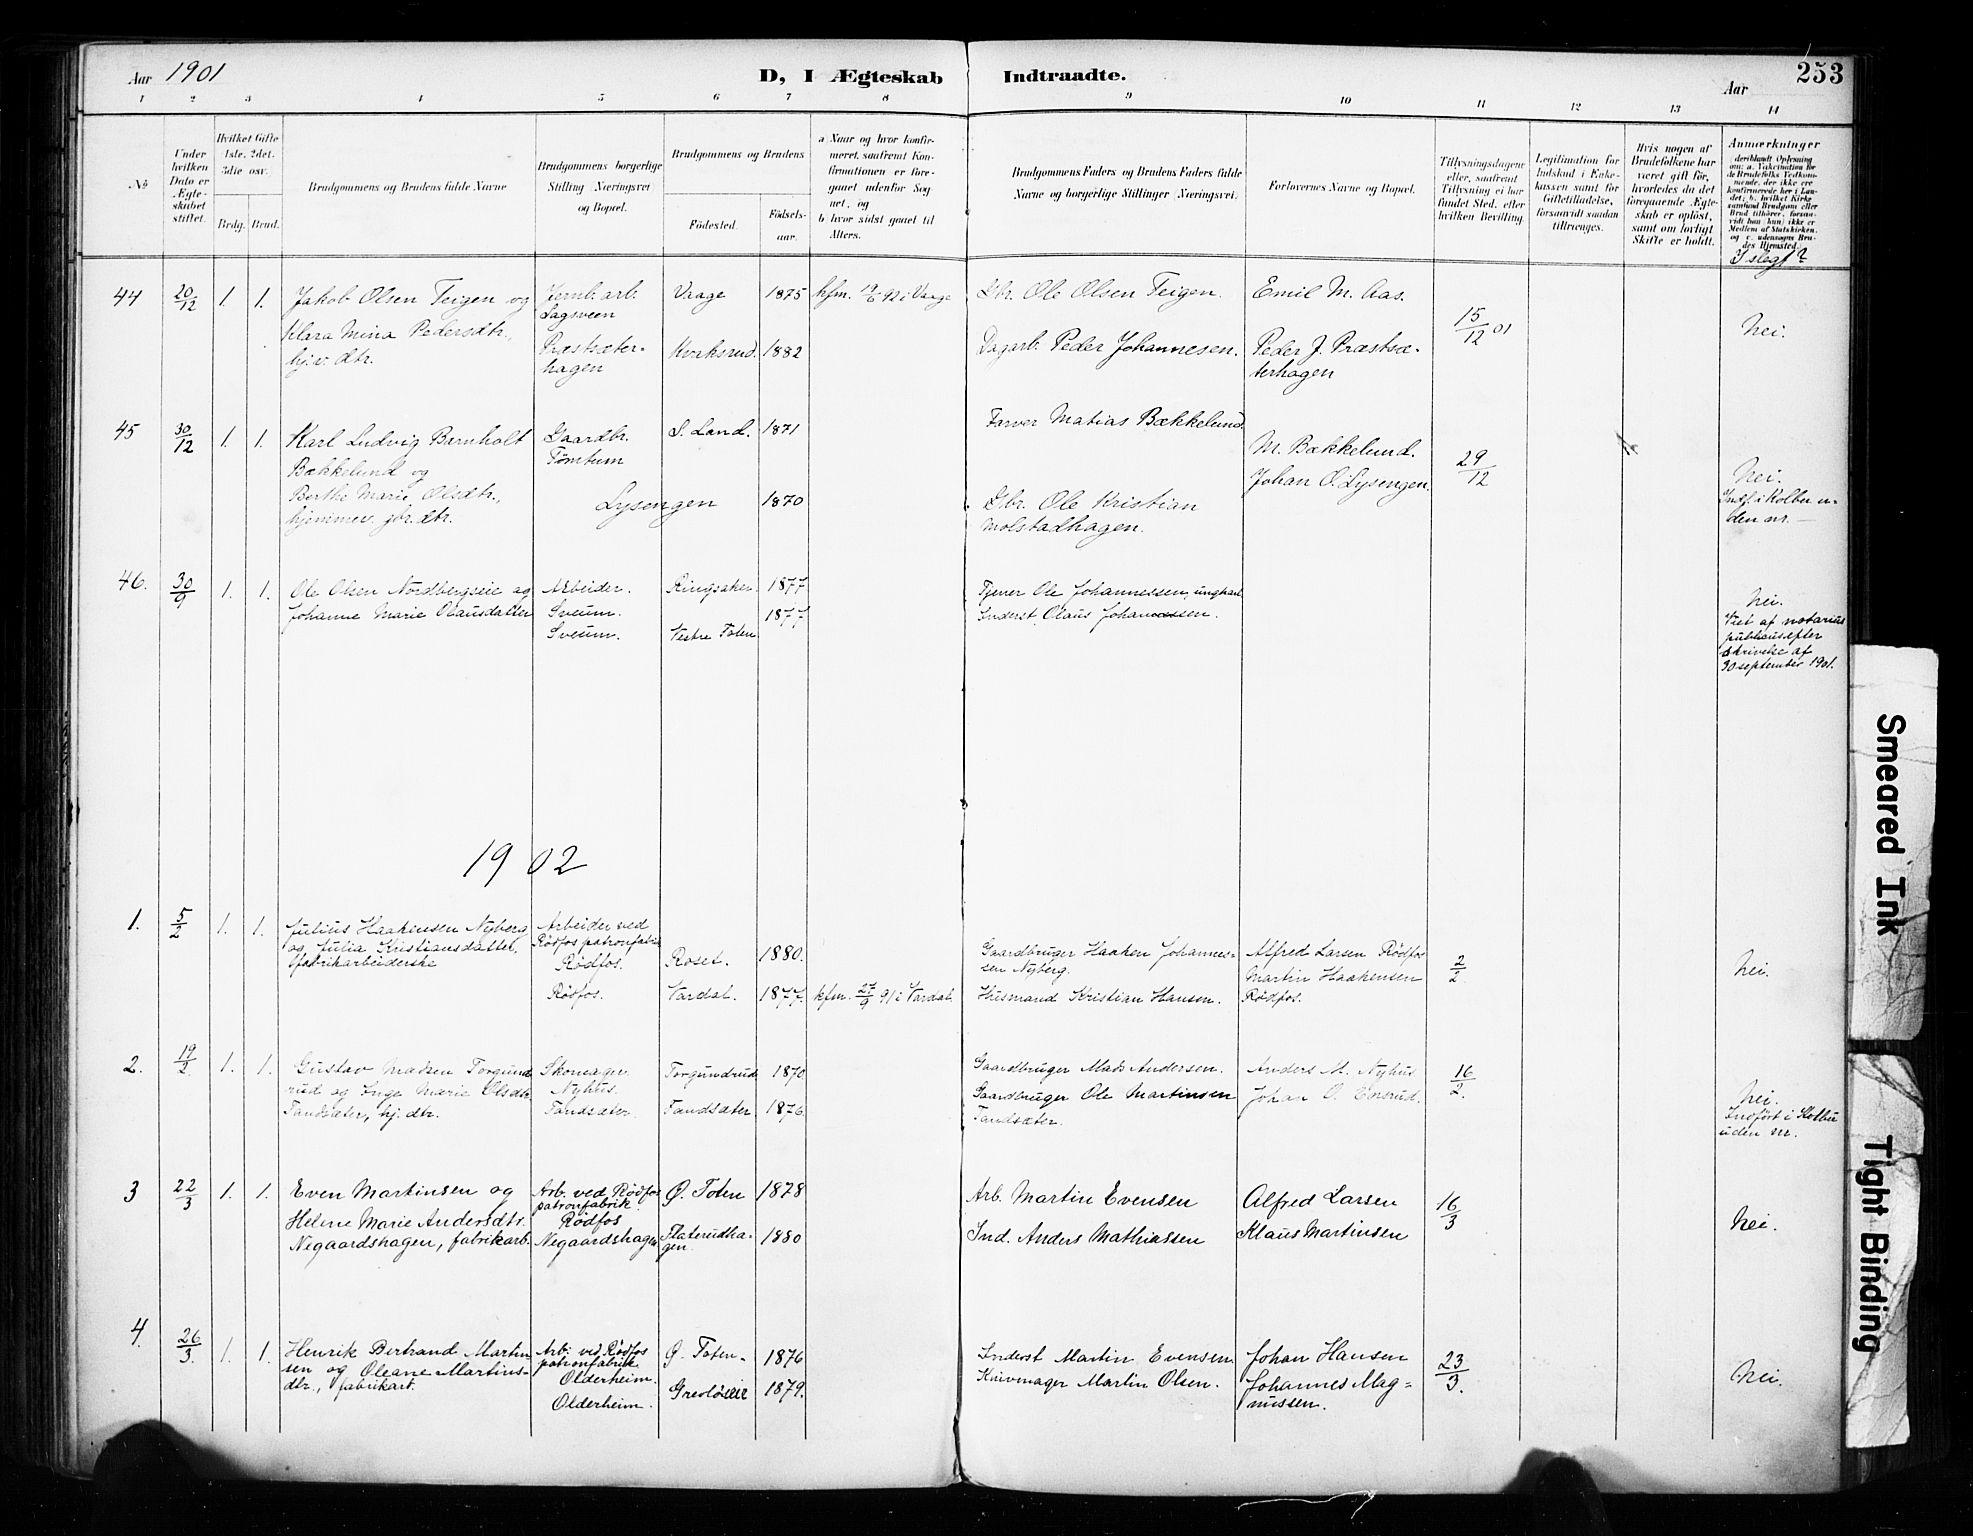 SAH, Vestre Toten prestekontor, H/Ha/Haa/L0011: Ministerialbok nr. 11, 1895-1906, s. 253